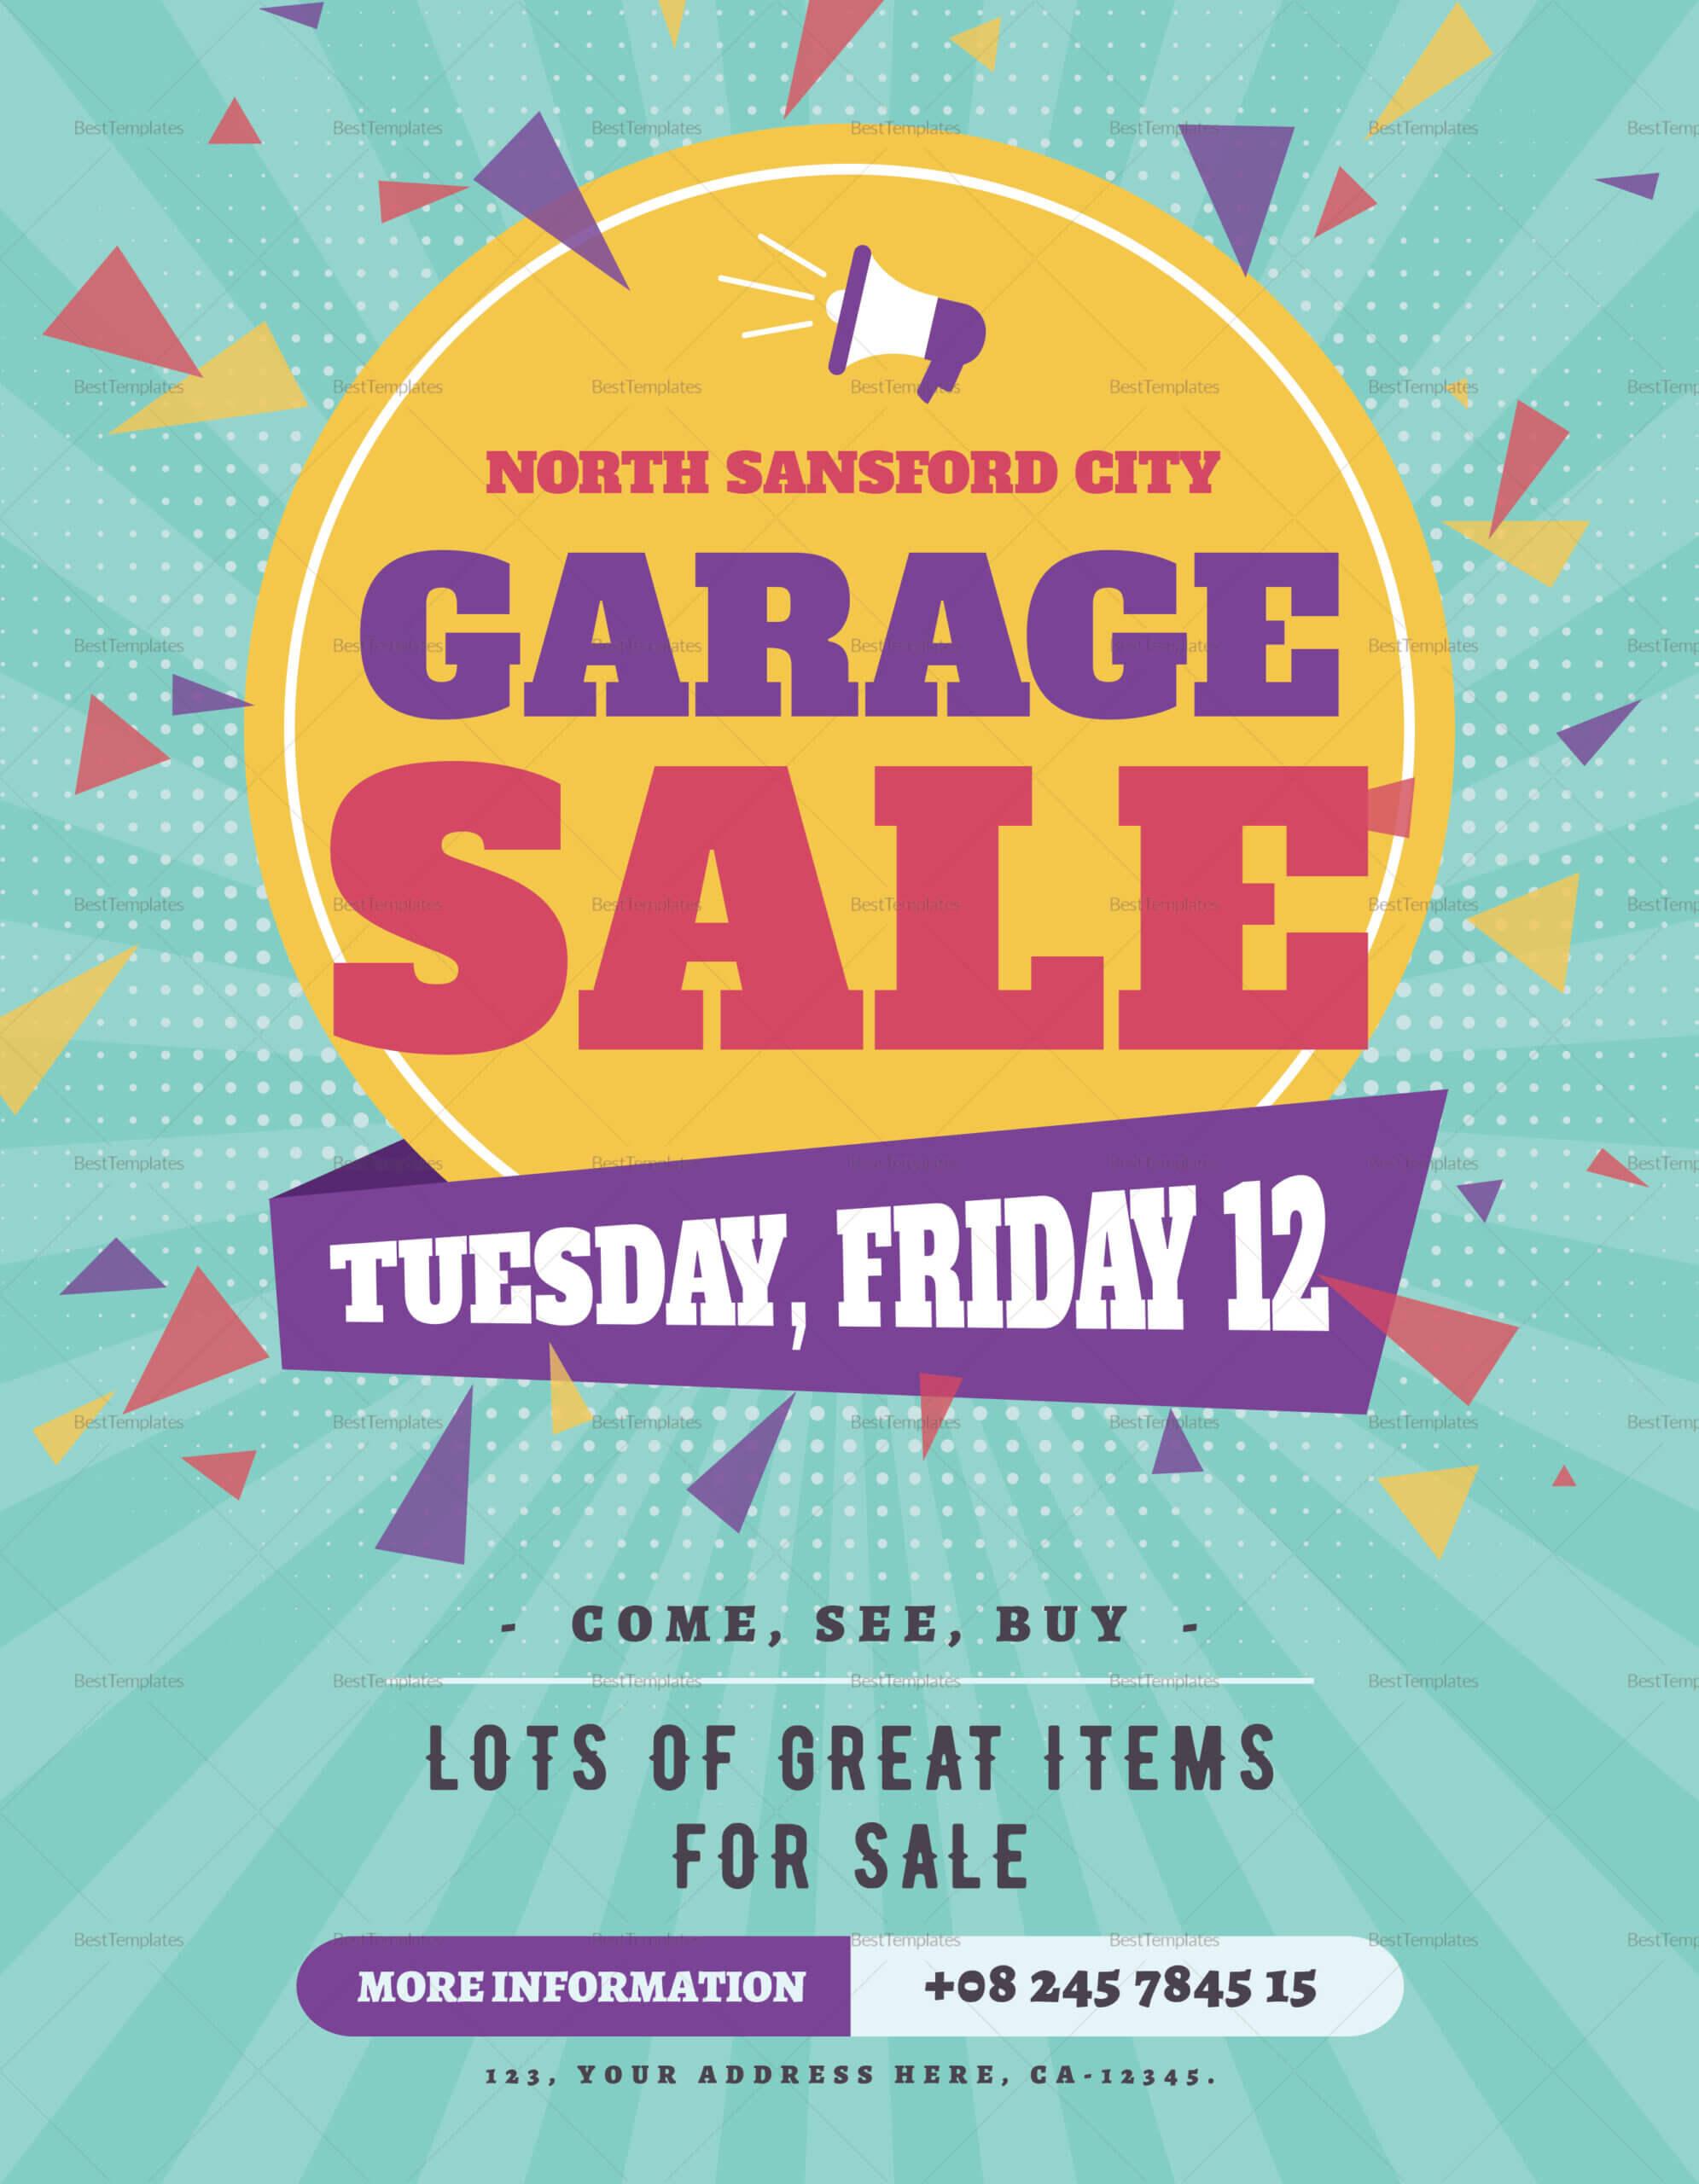 Large Garage Sale Flyer Template For Garage Sale Flyer Template Word